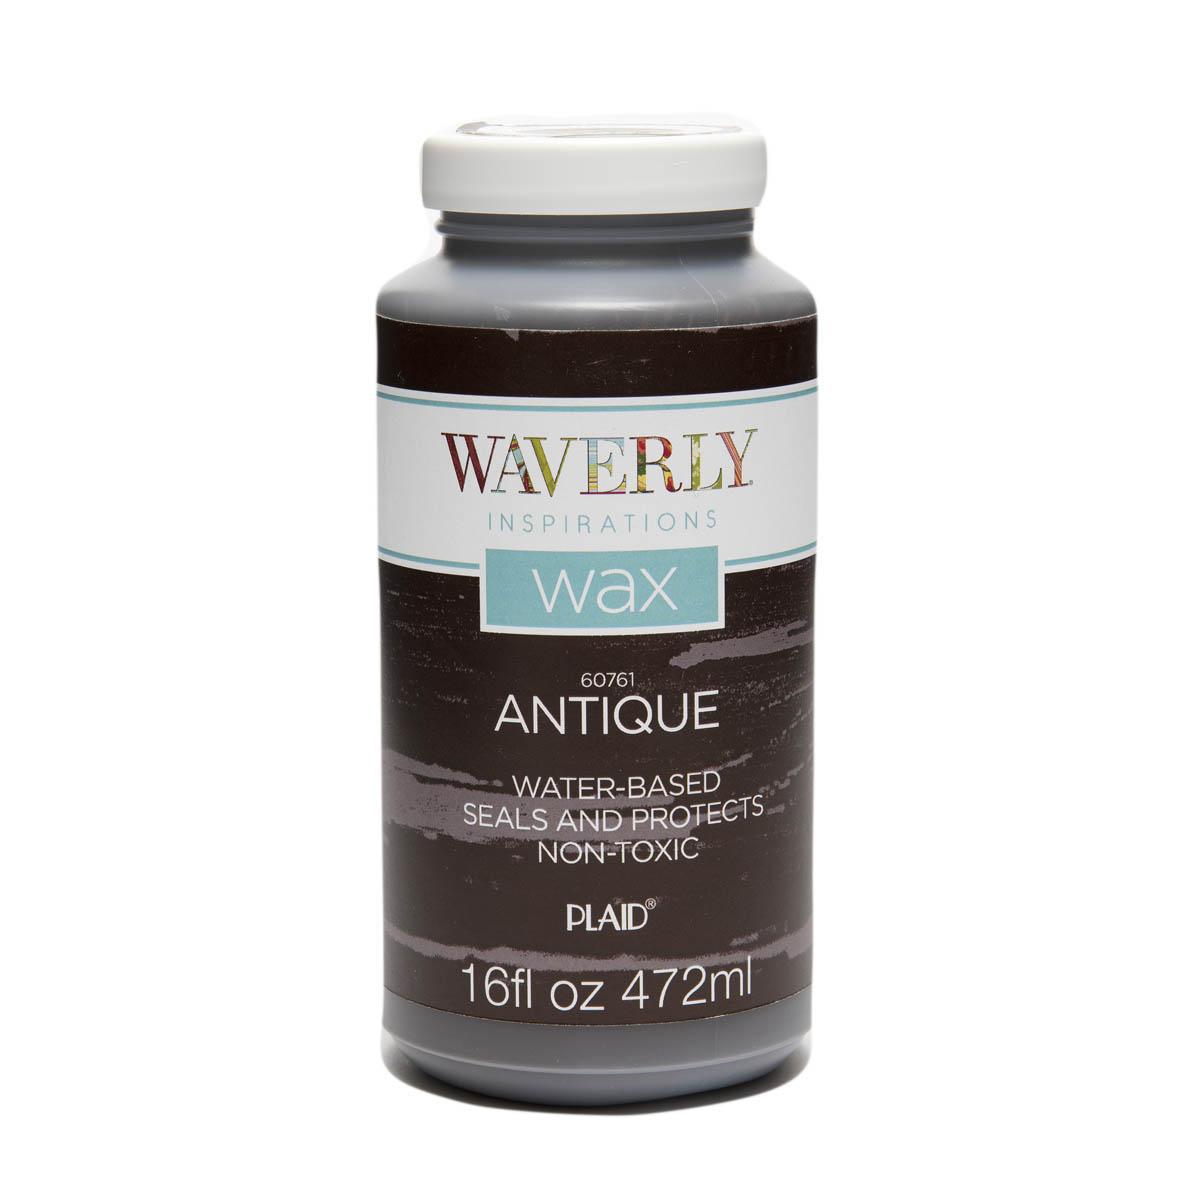 Waverly ® Inspirations Wax - Antique, 16 oz. - 60761E